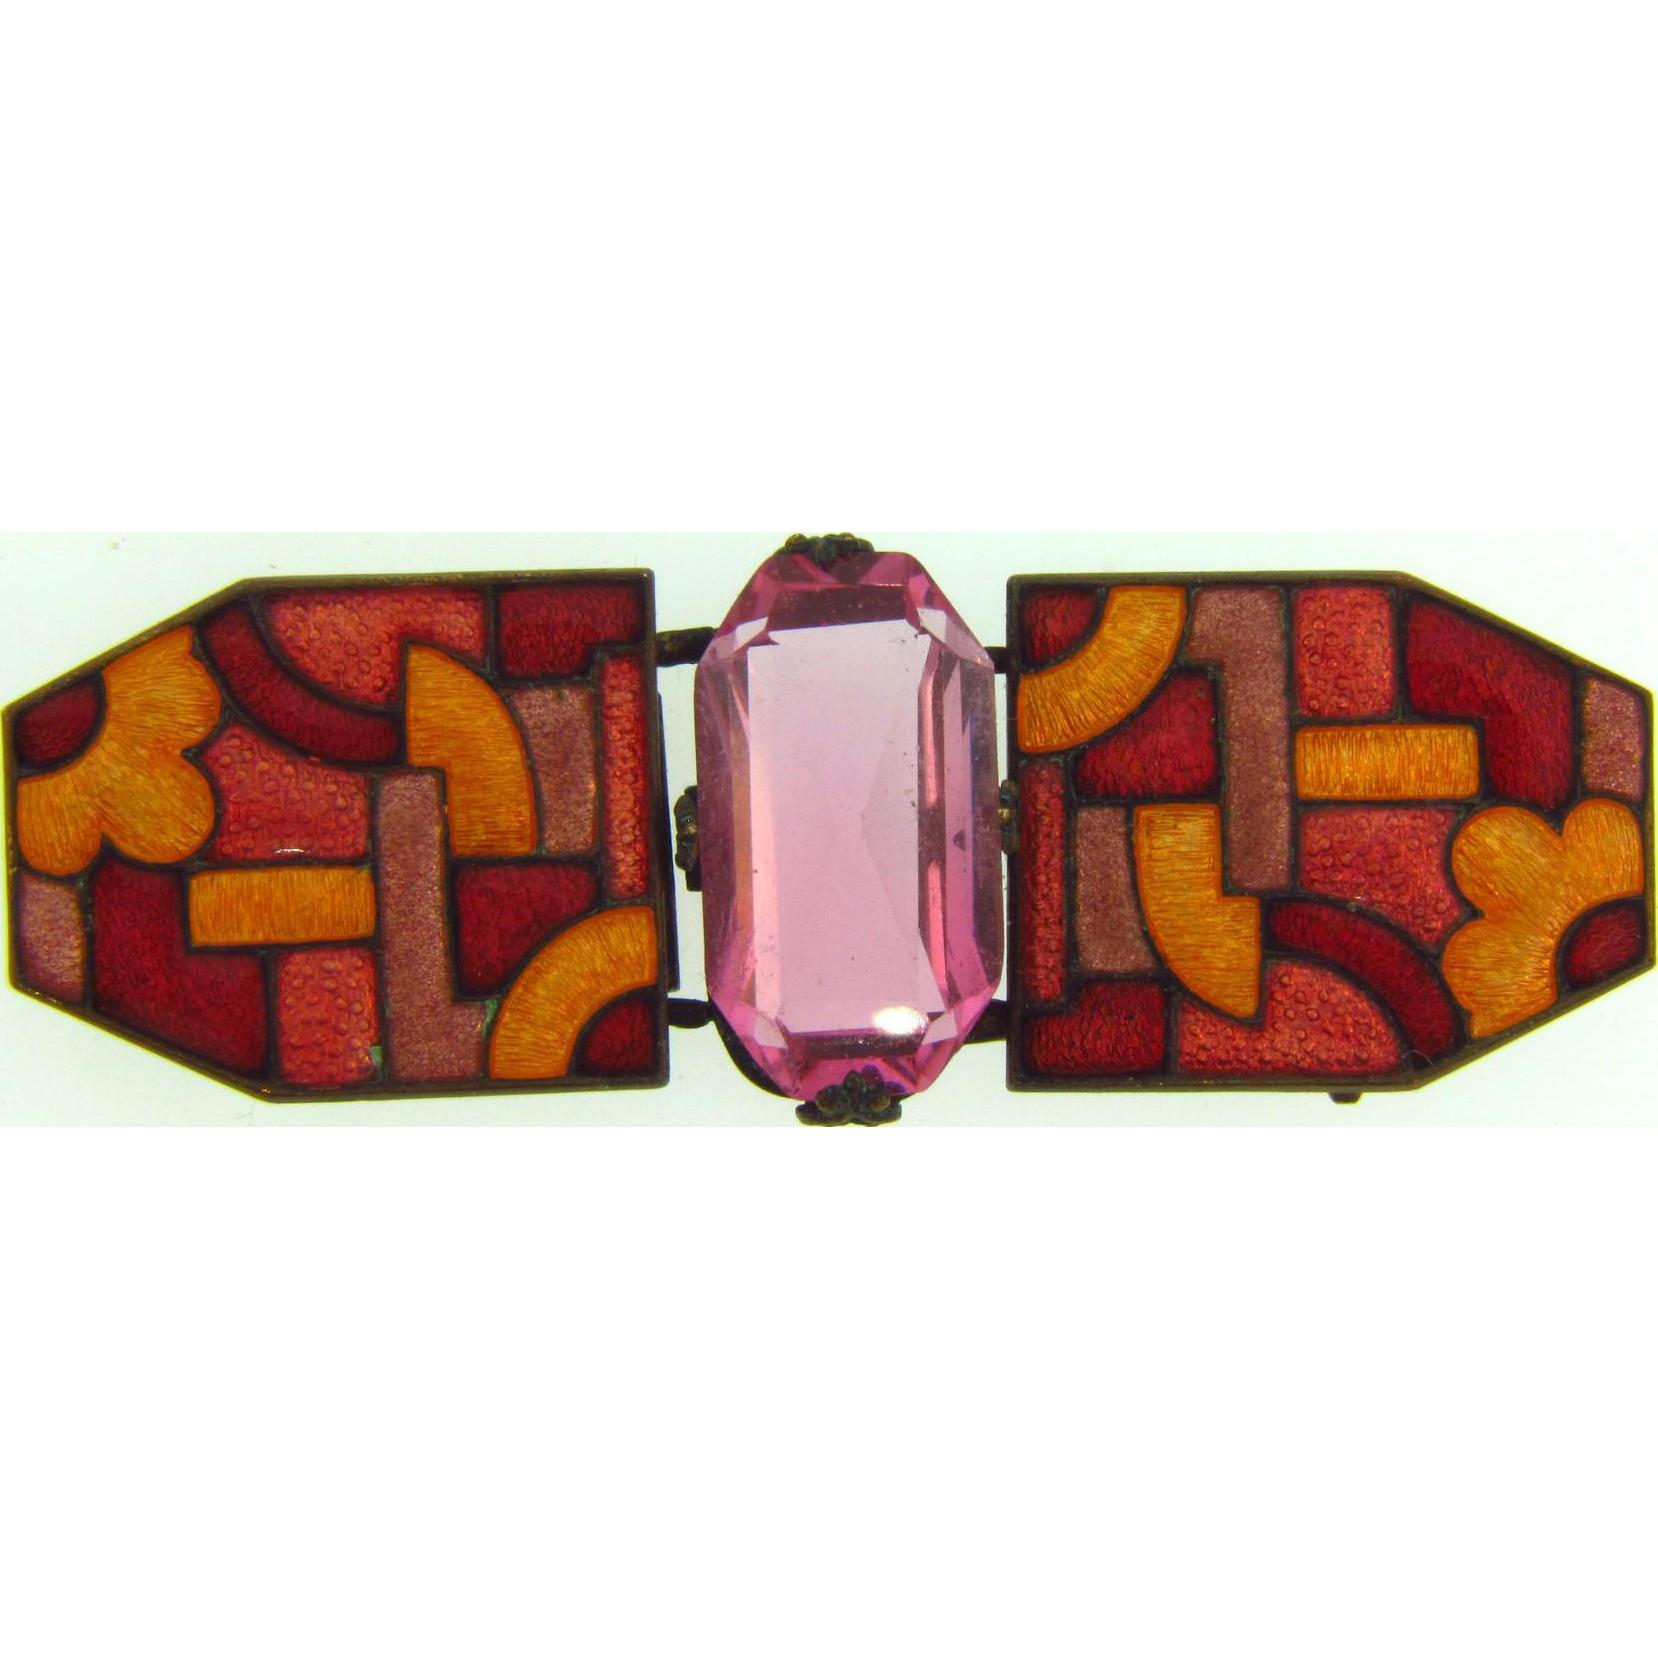 Marked Czecho-slovakia enamel Belt Buckle with pink glass stone